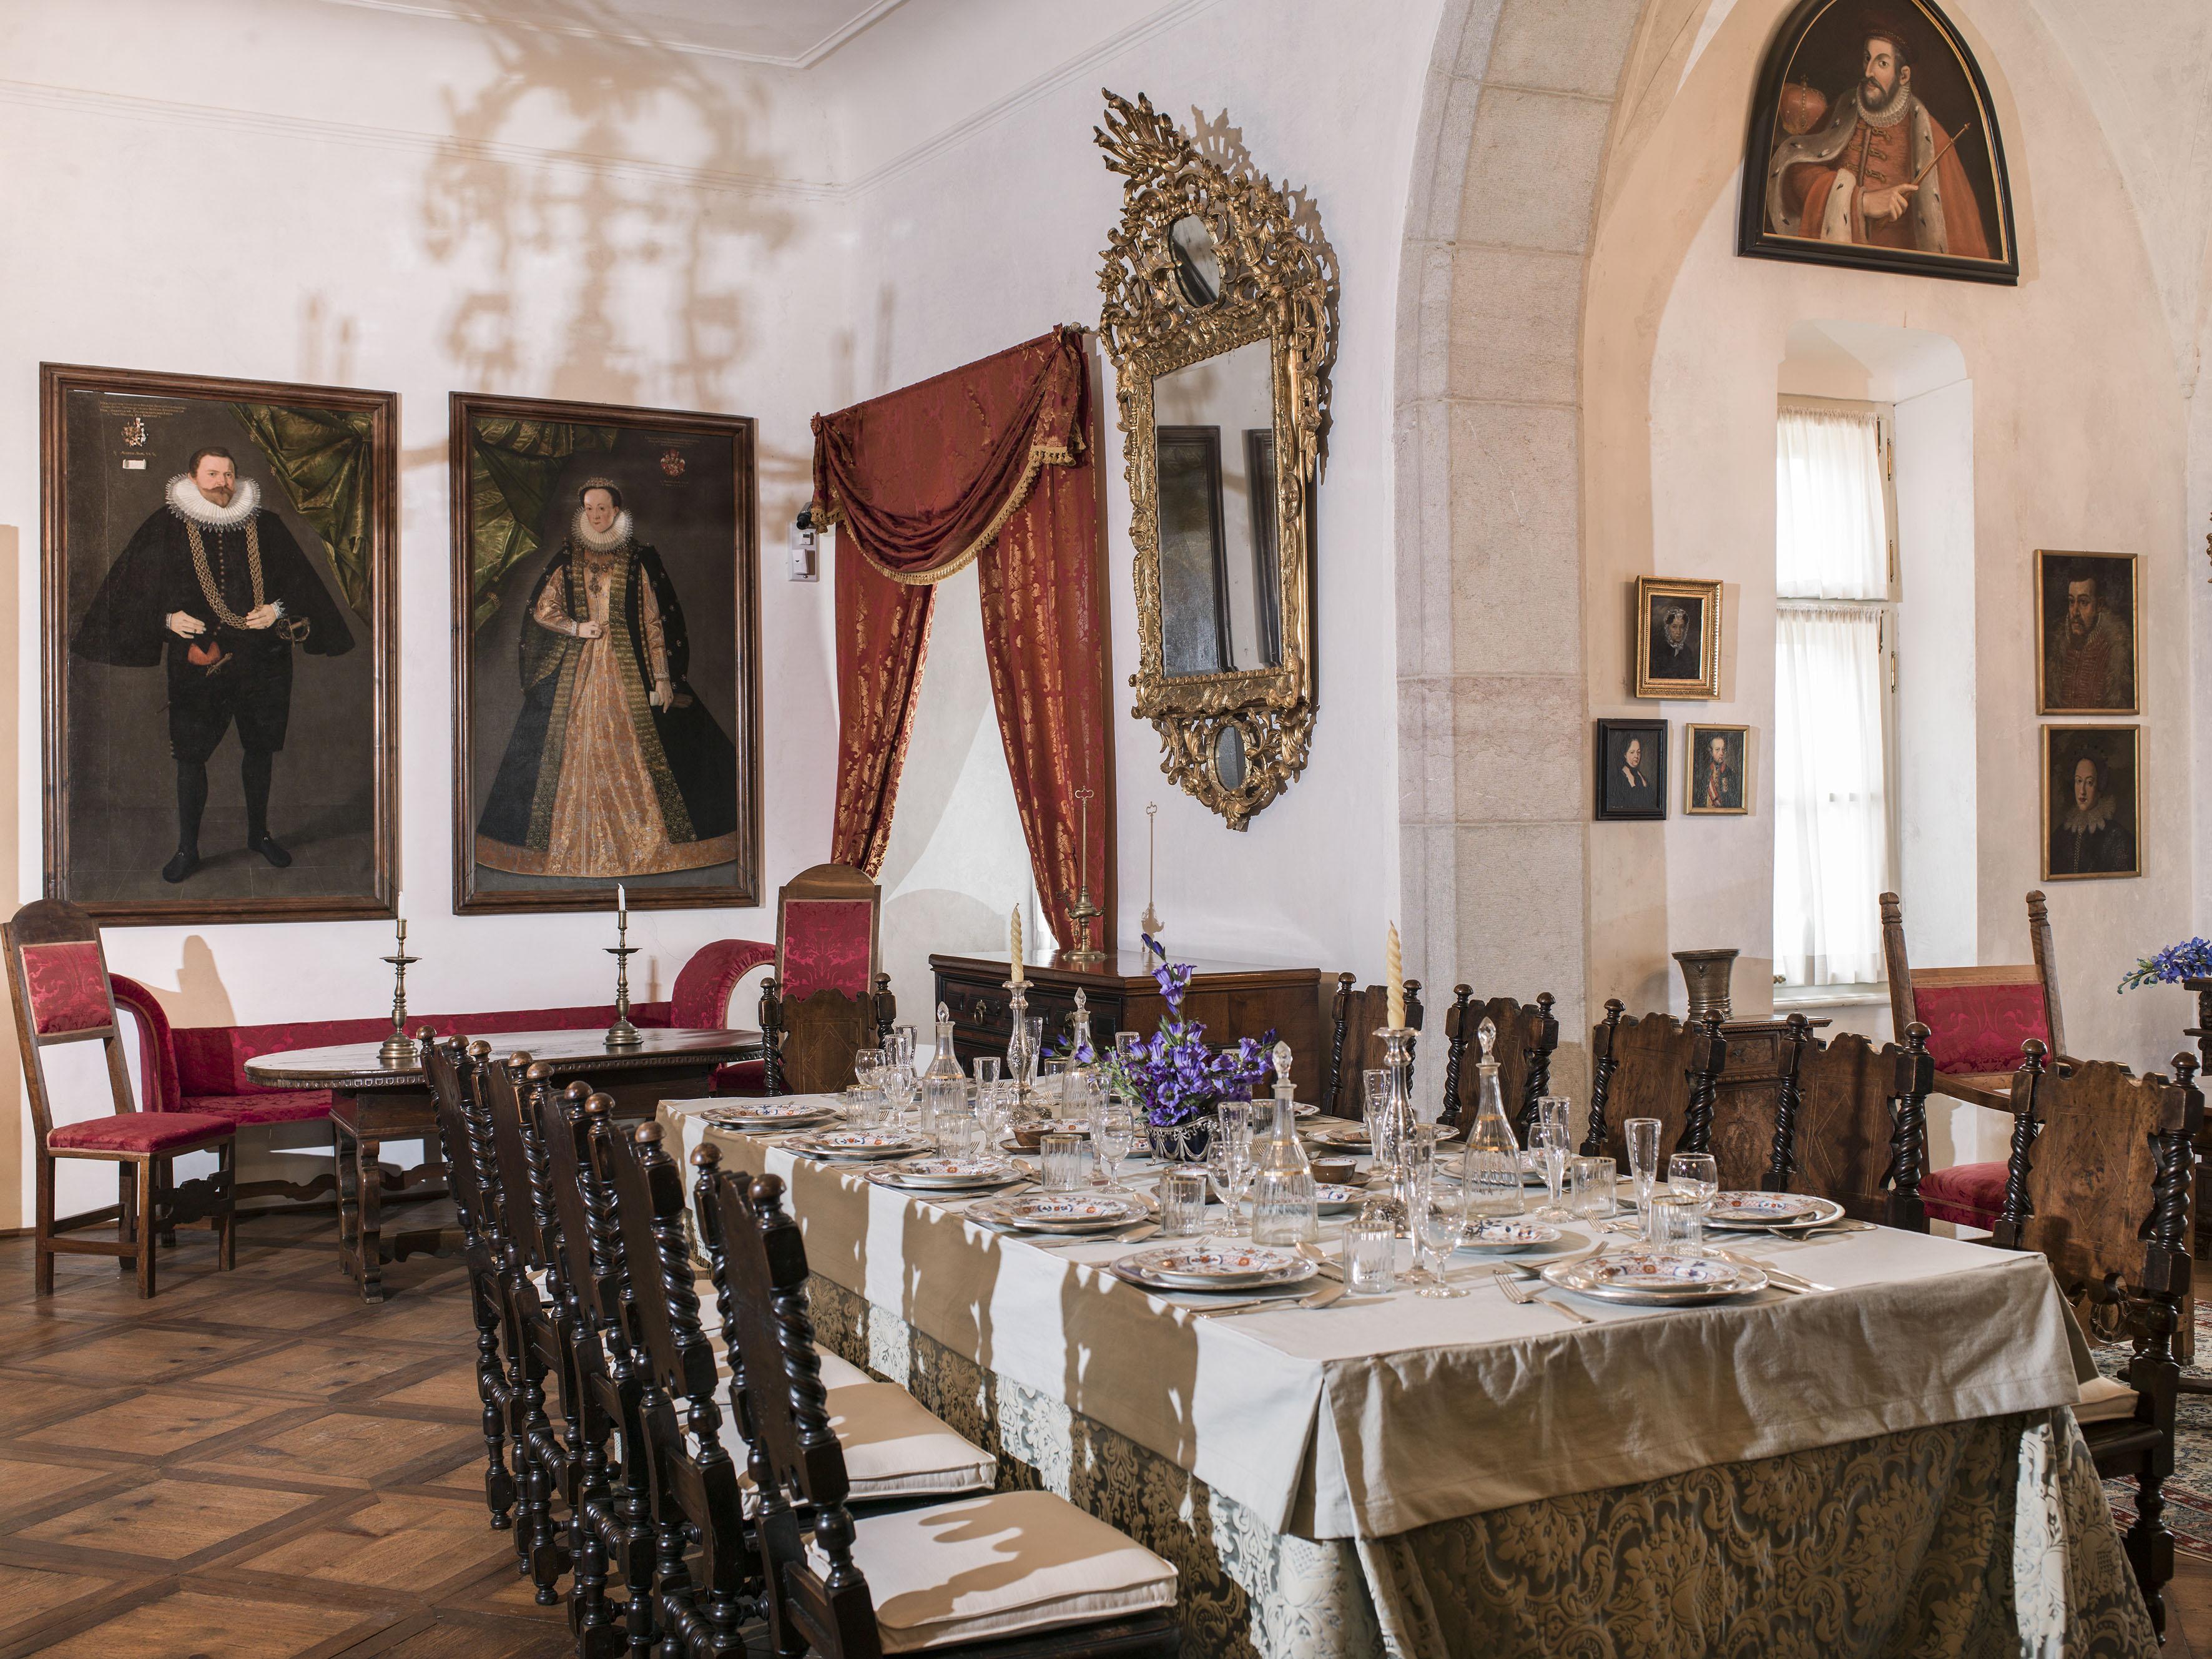 Castel Thun Nuove Atmosfere